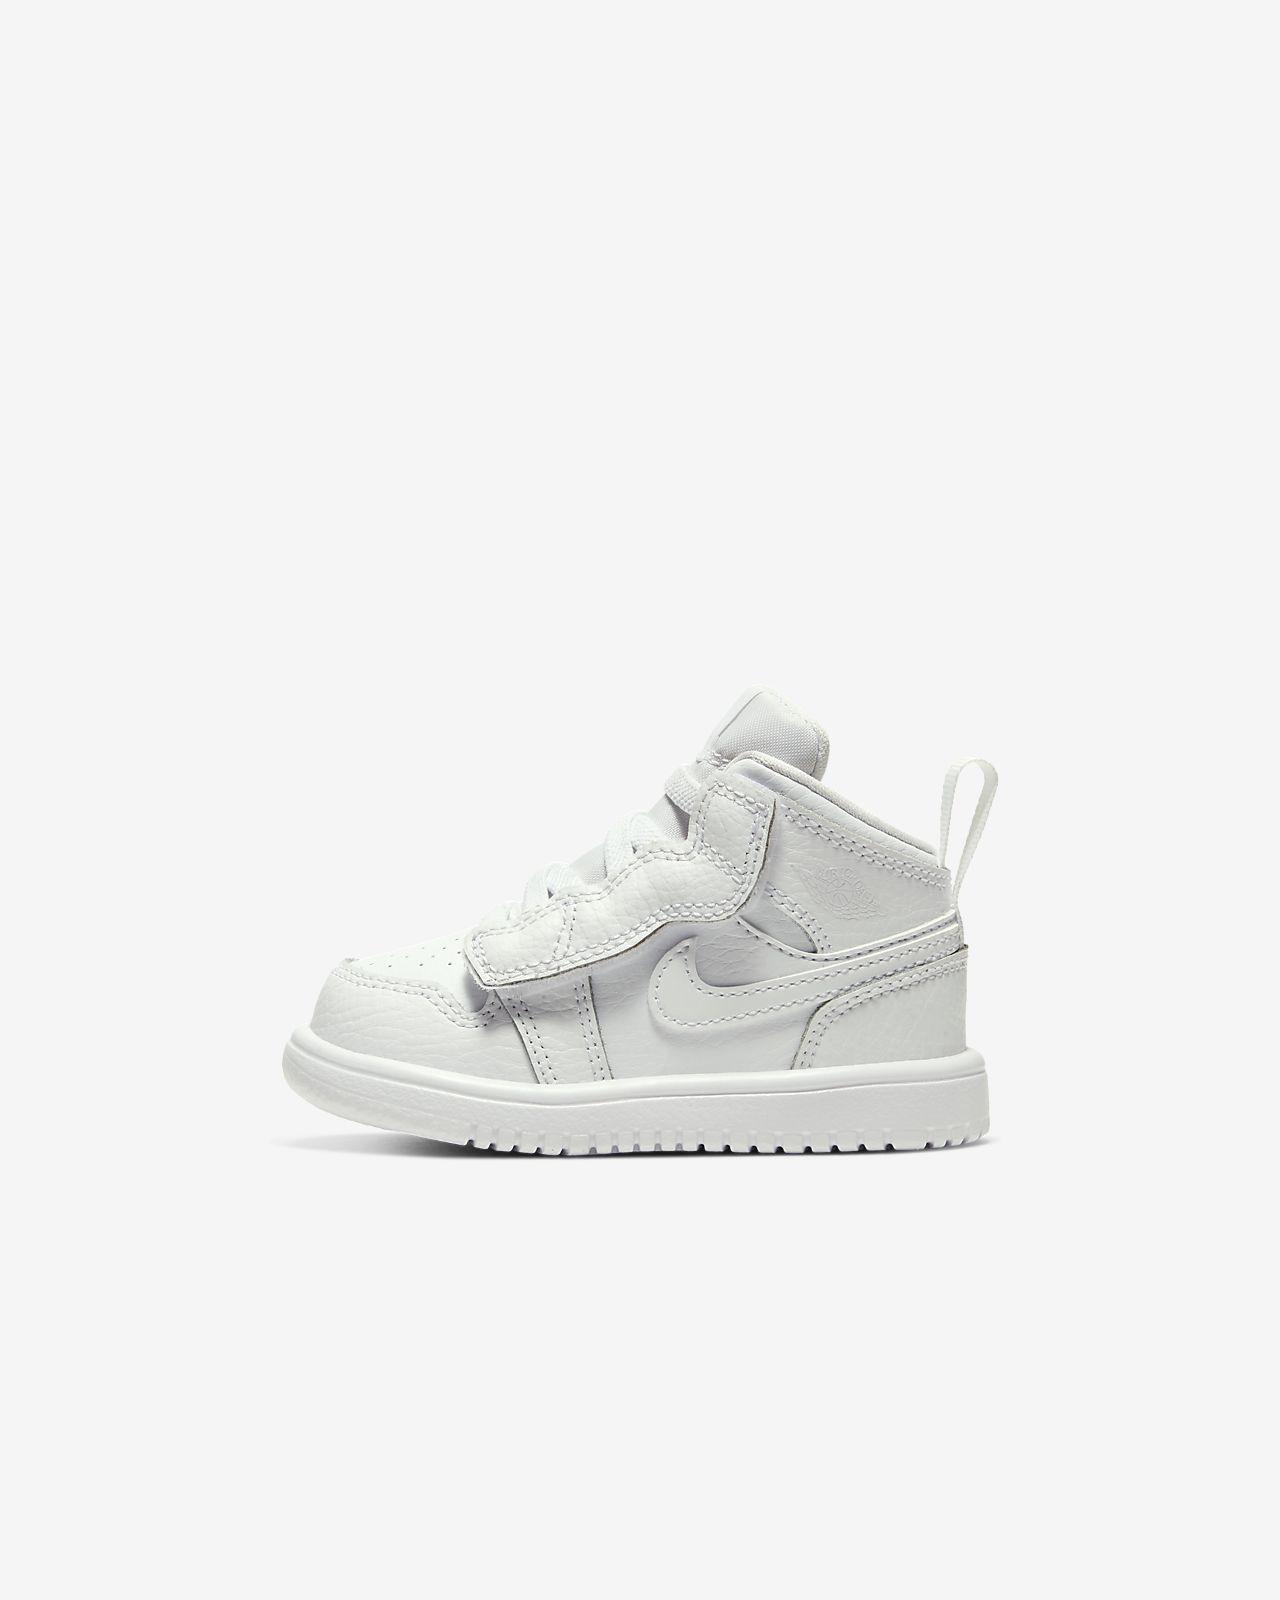 Mid Alt Baby \u0026amp; Toddler Shoe. Nike EG